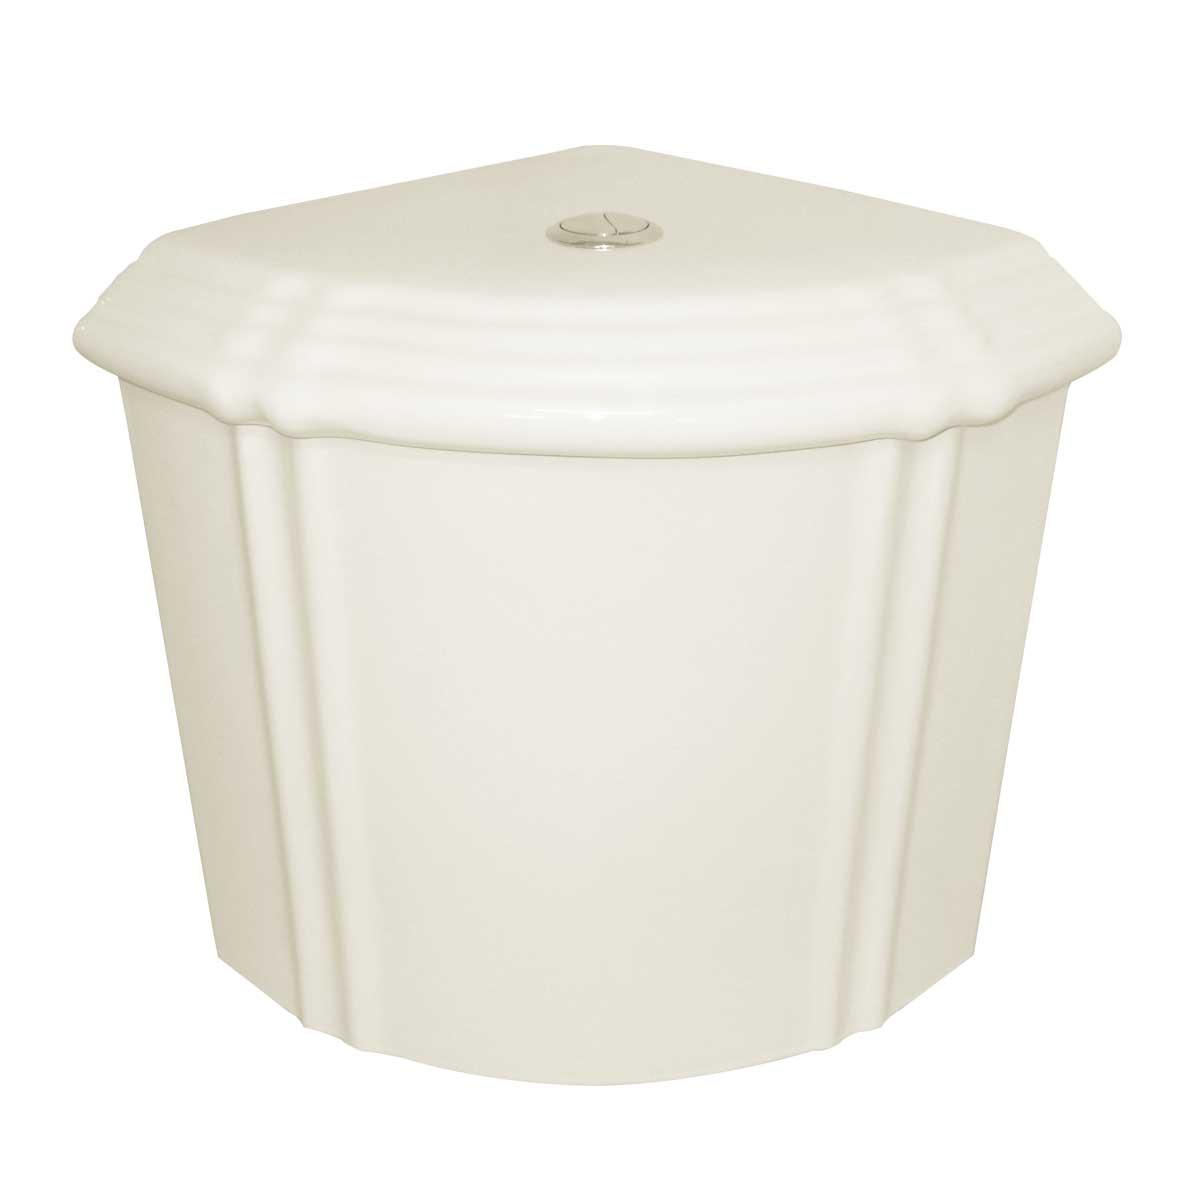 Toilet Bone China Sheffield Deluxe Corner Tank Only | Ren...